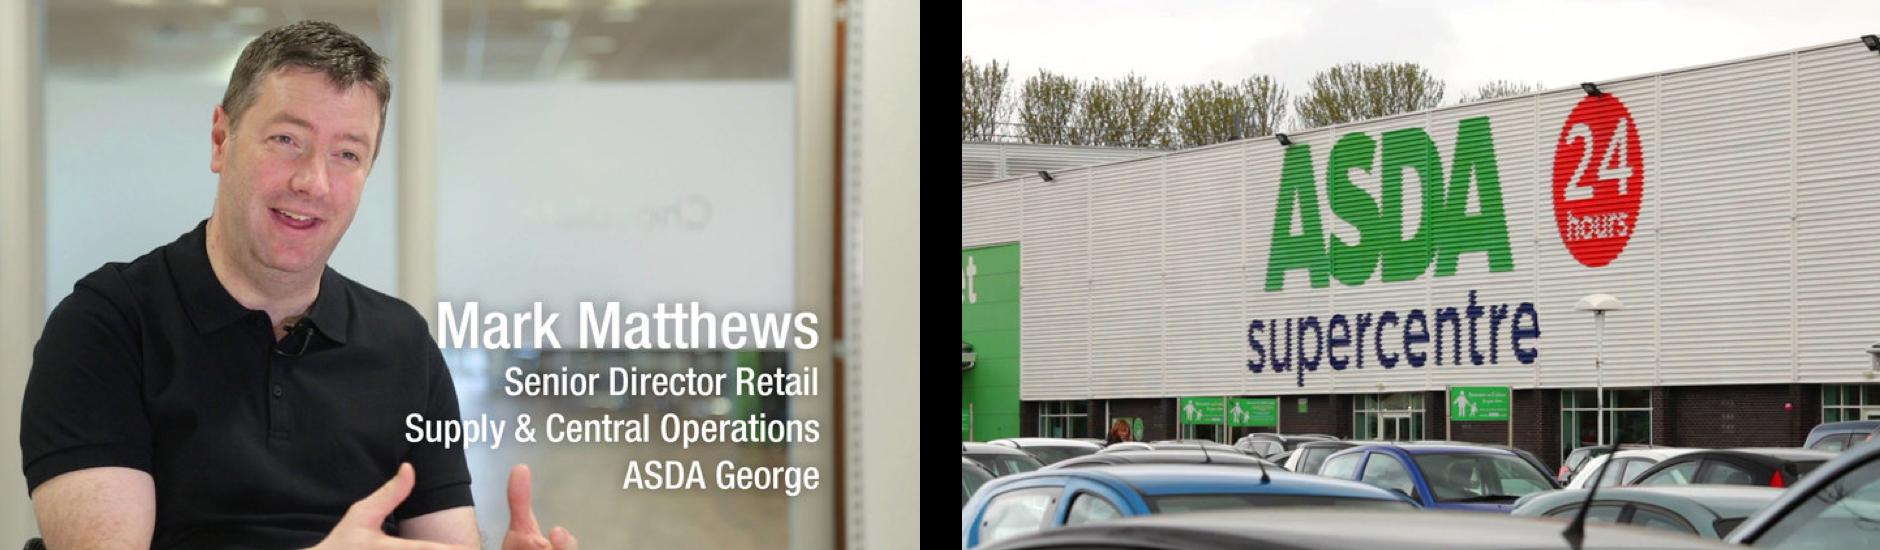 ASDA George Retail Future Retail Retail Software Solutions